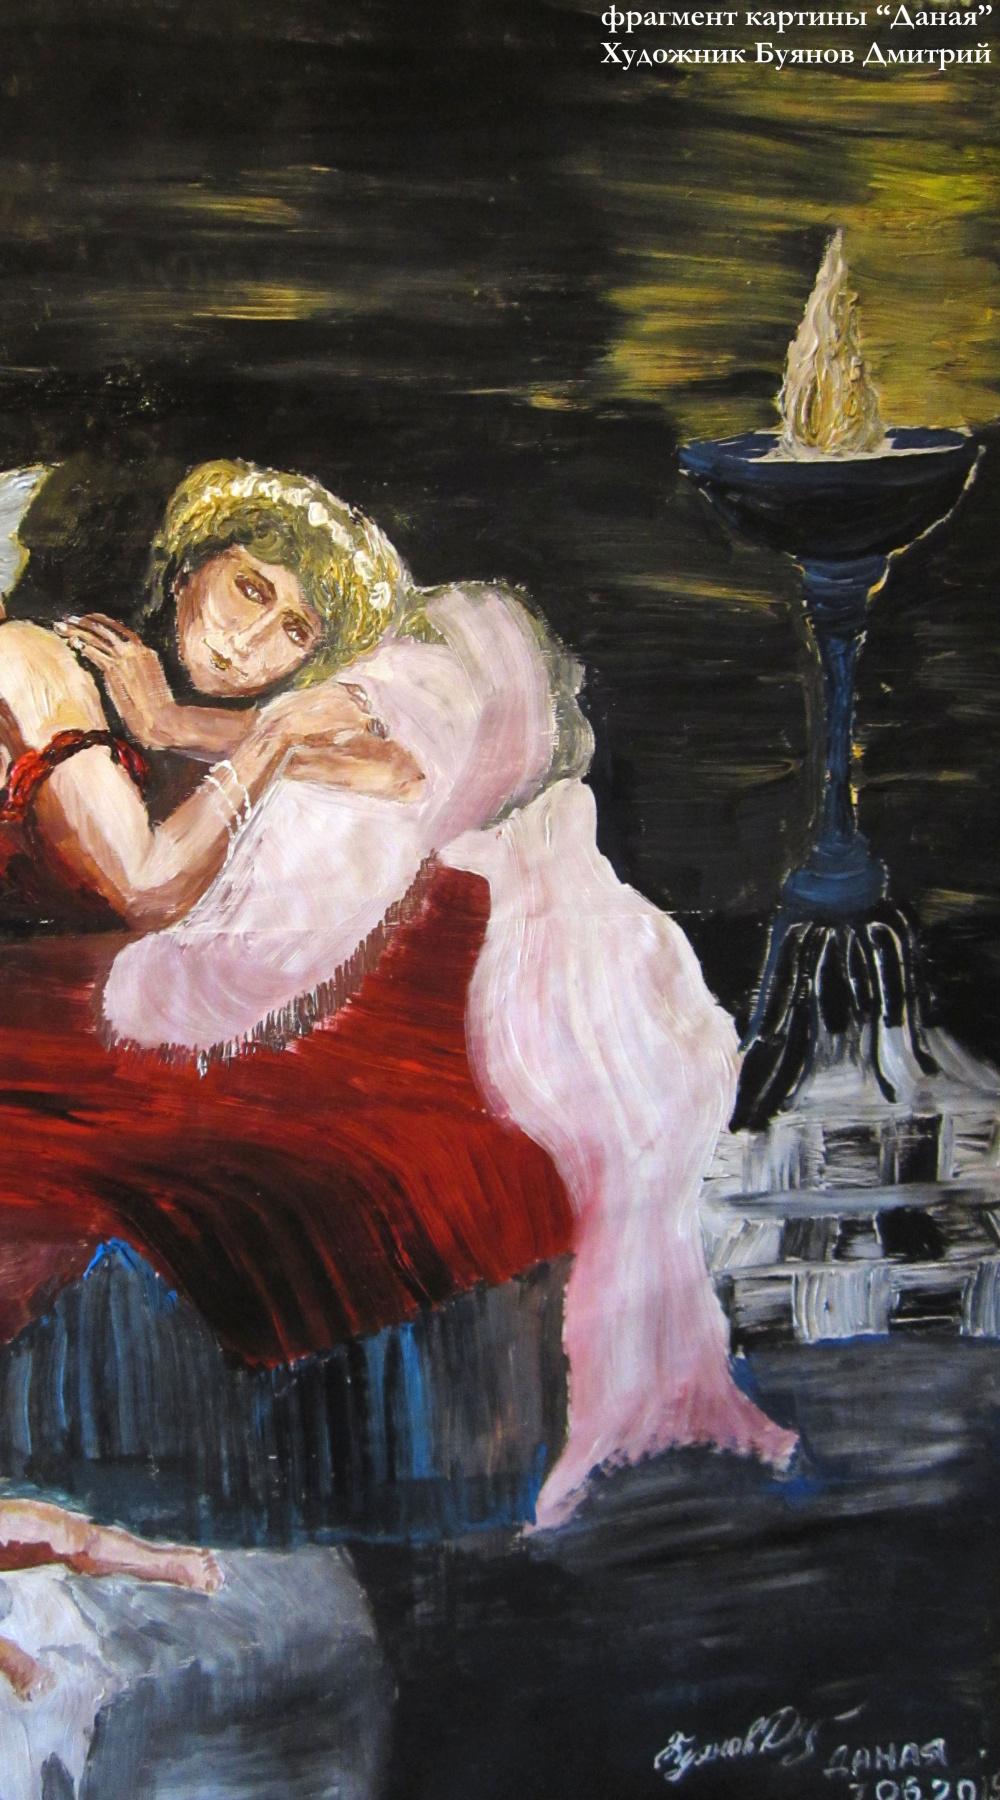 "Дмитрий Юрьевич Буянов. Slice # 2 of the painting ""Danae"" the Artist Dmitry Buyanov"